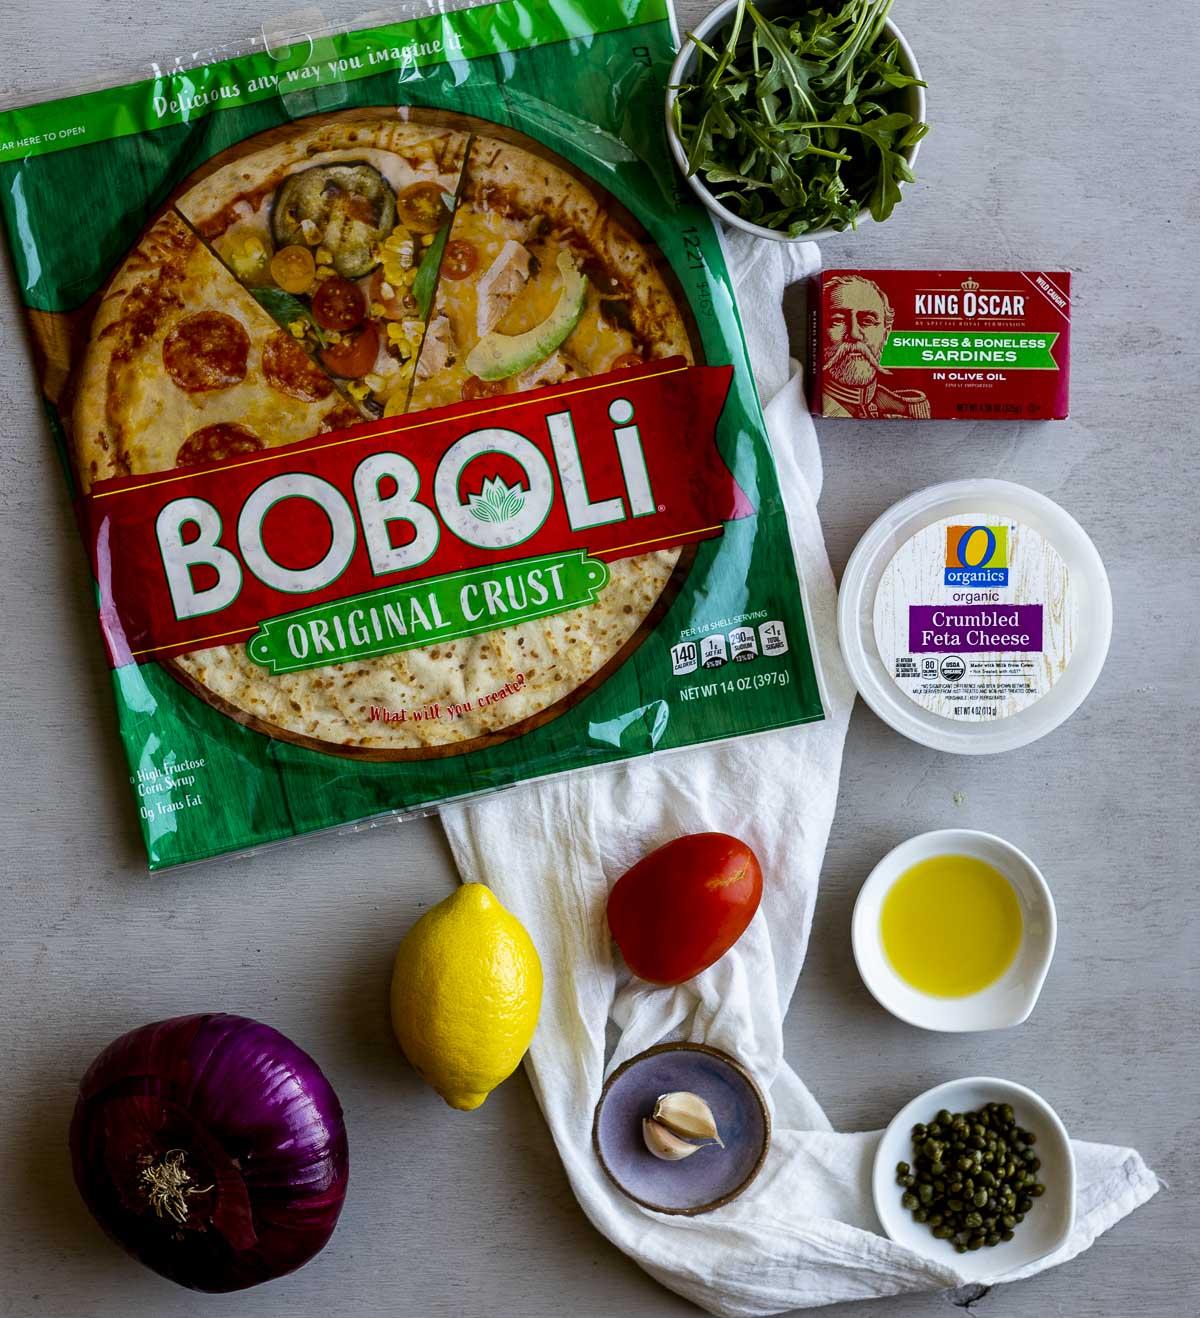 Ingredients to make sardine pizza arranged individually.